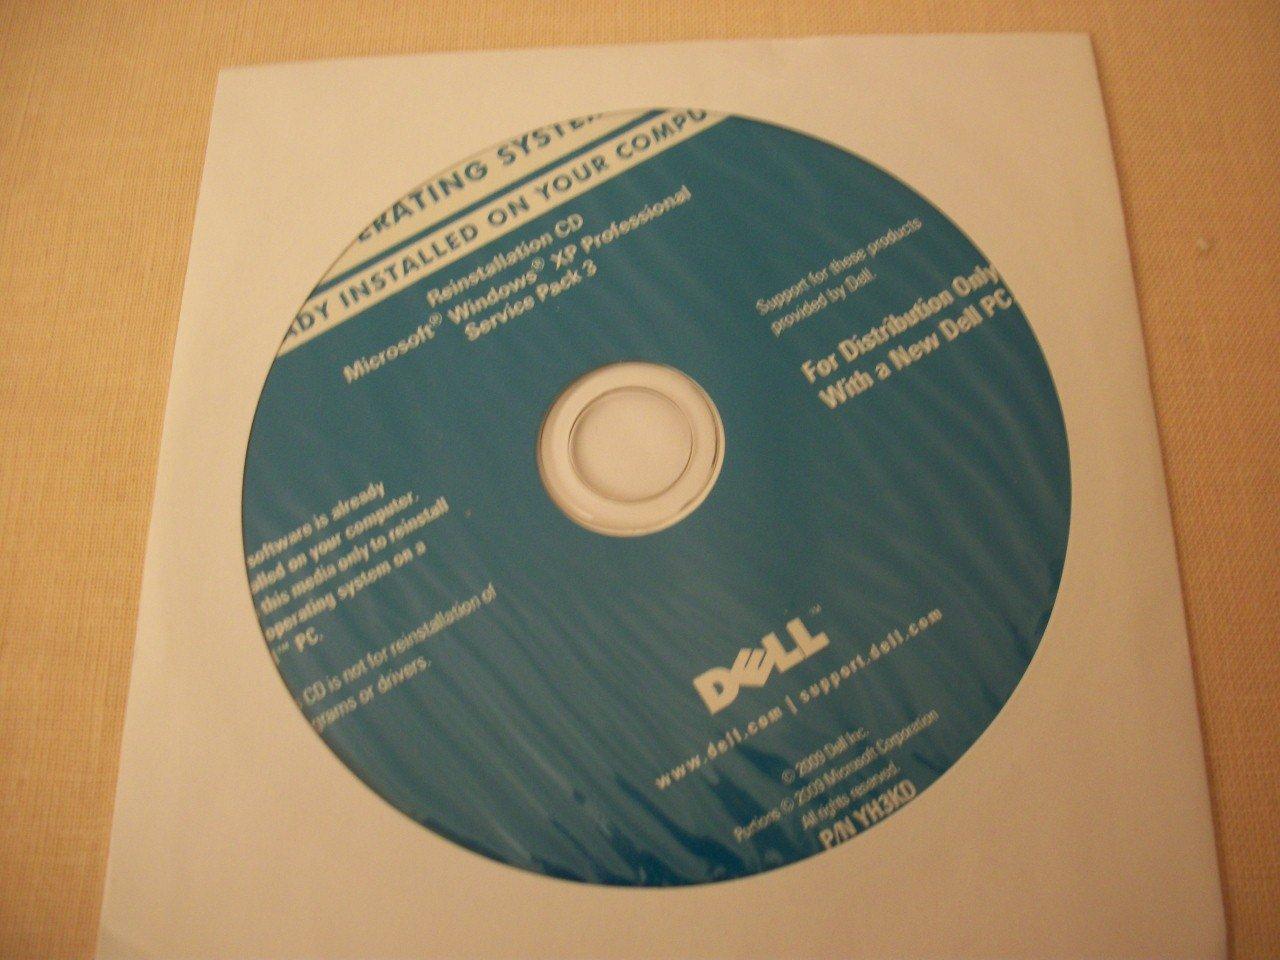 Like NEW DELL GENUINE Microsoft Windows XP Professional Reinstallation SP3 CD